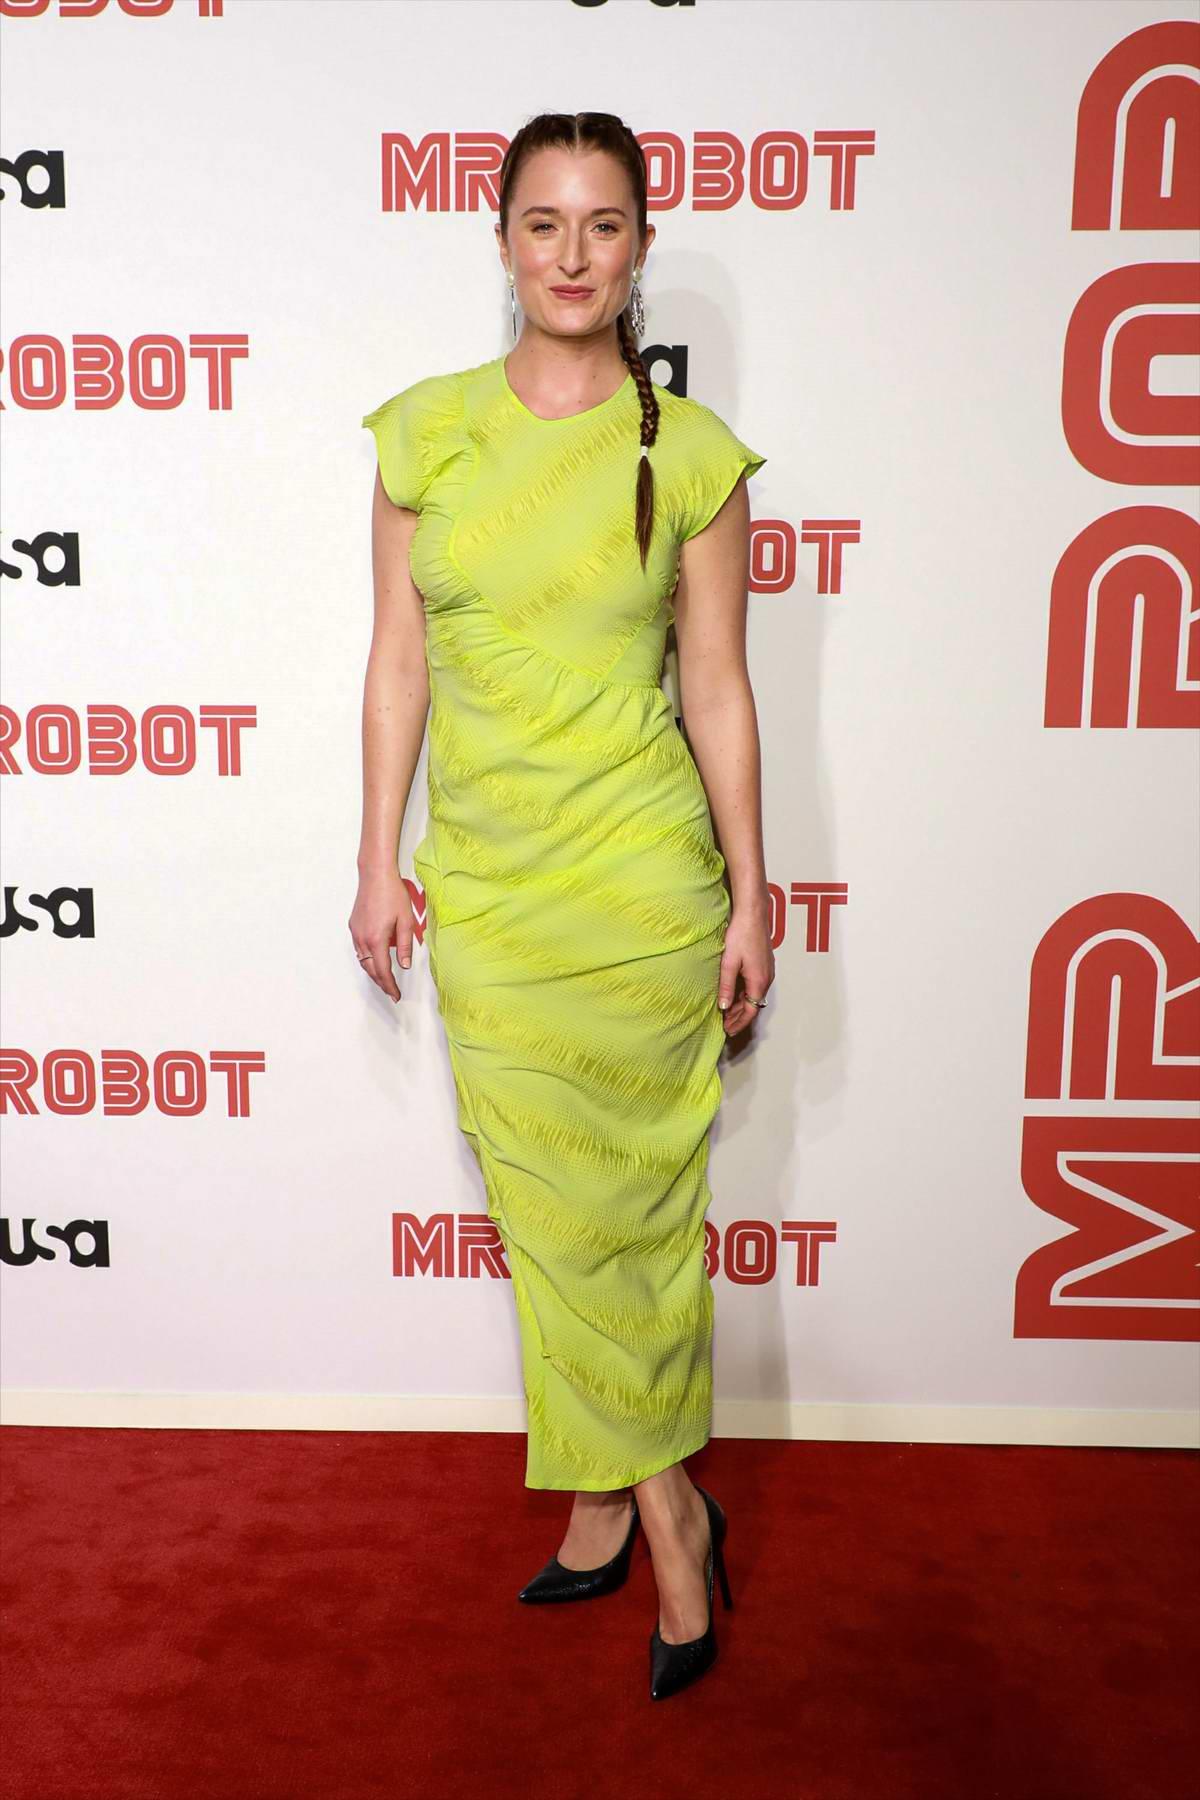 Grace Gummer attends 'Mr Robot' Season 4 premiere at Village East Cinema in New York City